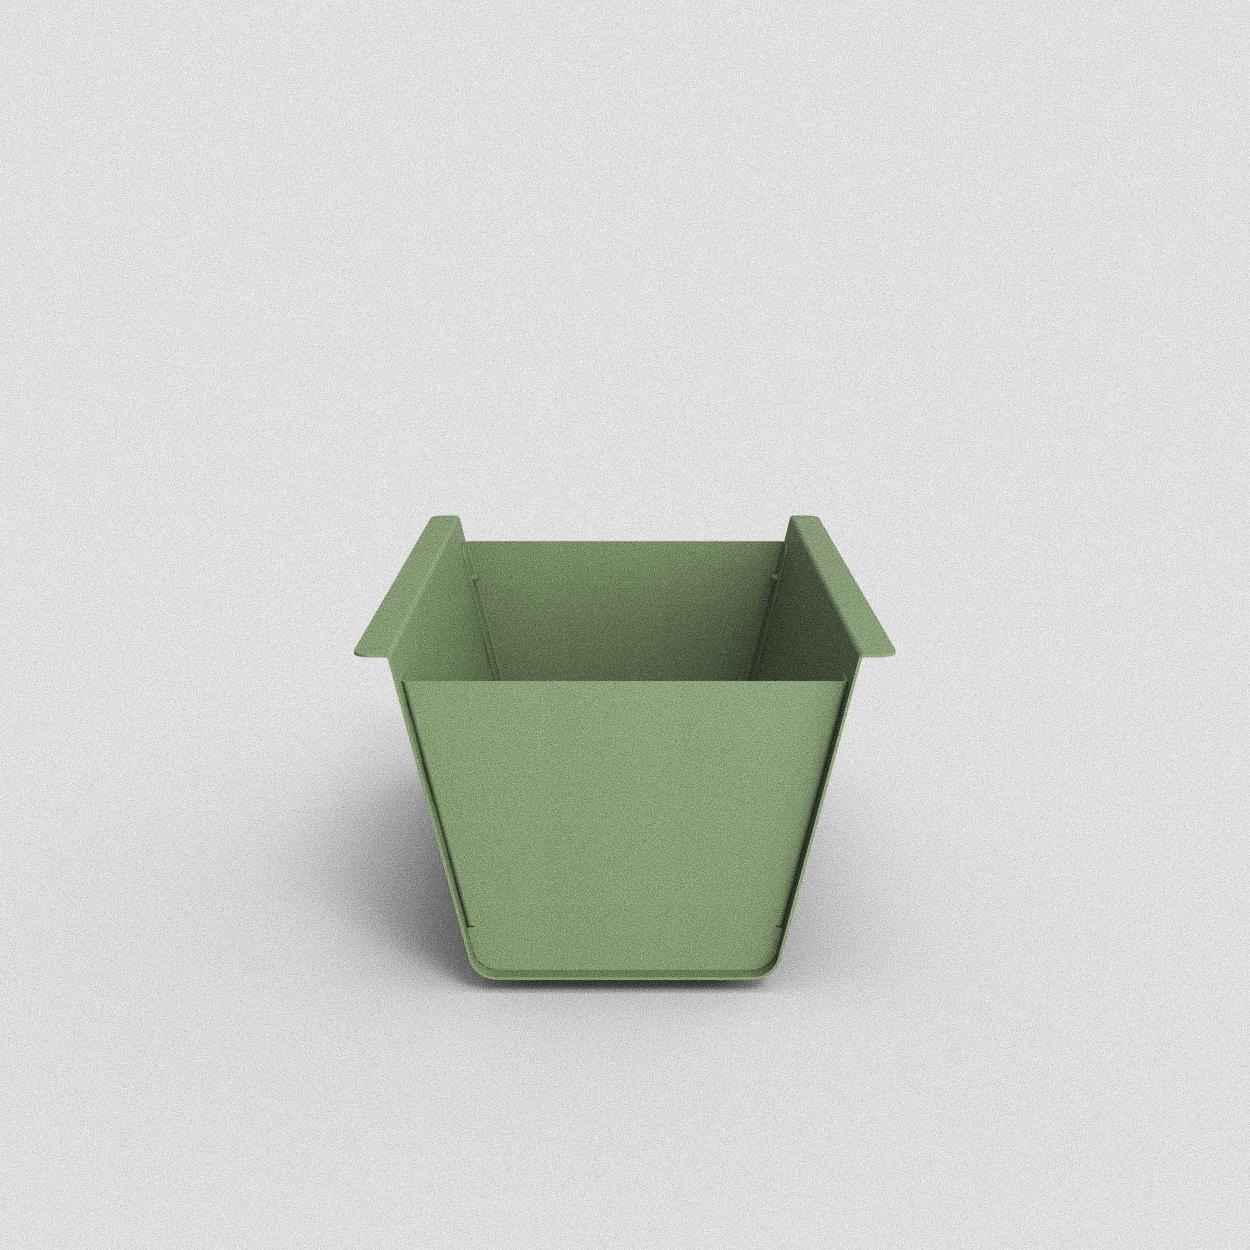 135L / Standardfärg: Mossa